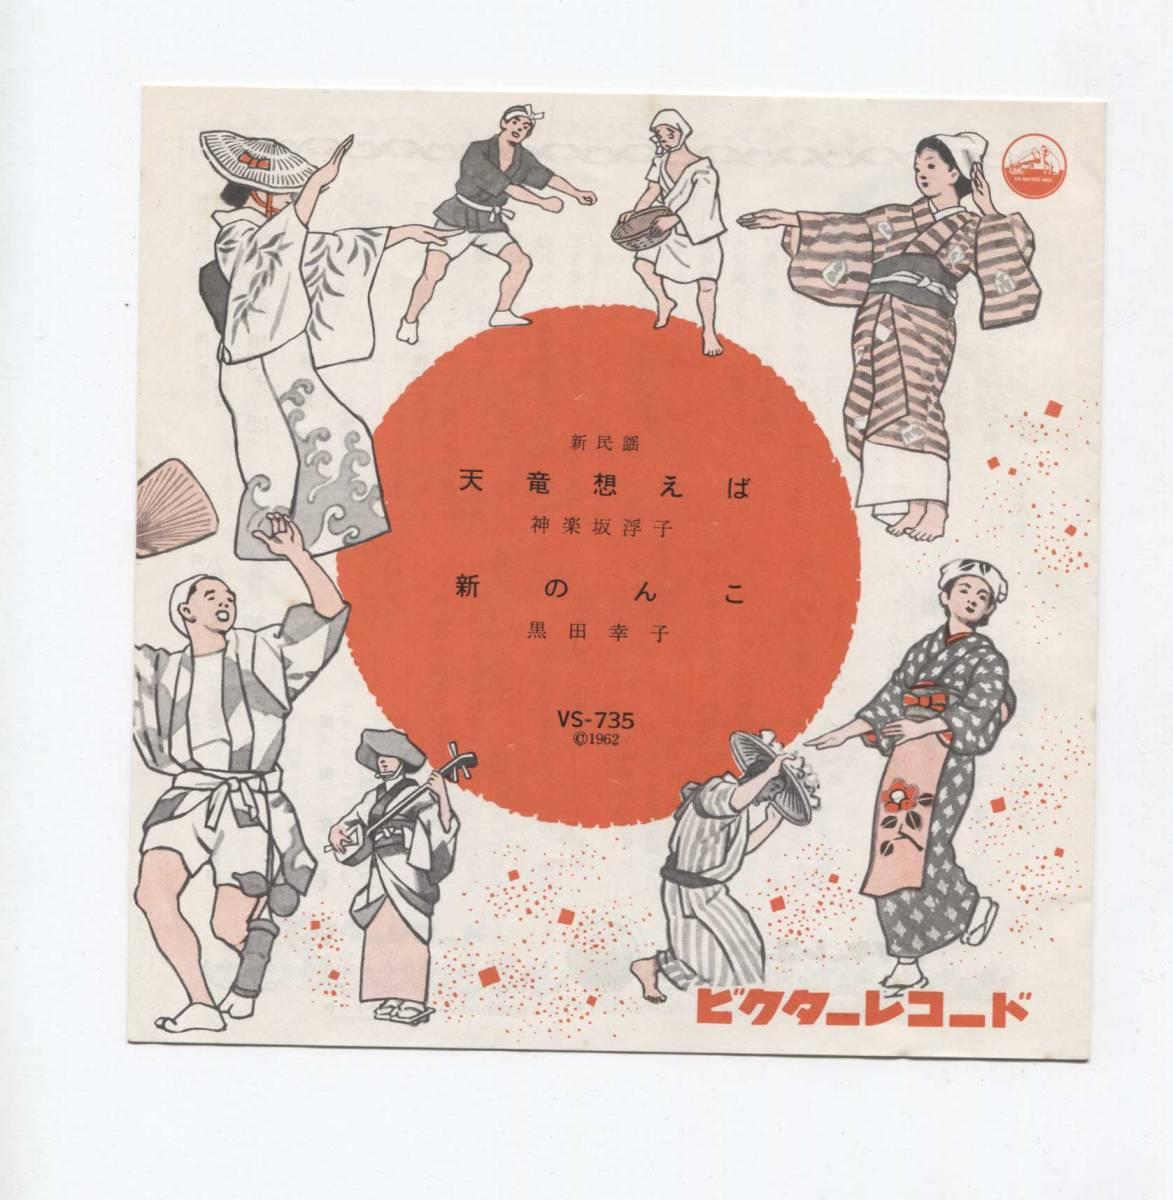 【EP レコード シングル 同梱歓迎】 神楽坂浮子 ■ 天竜想えば ■ 黒田幸子 ■ 新のんこ ■ 振り付き 新民謡  新のんのこ